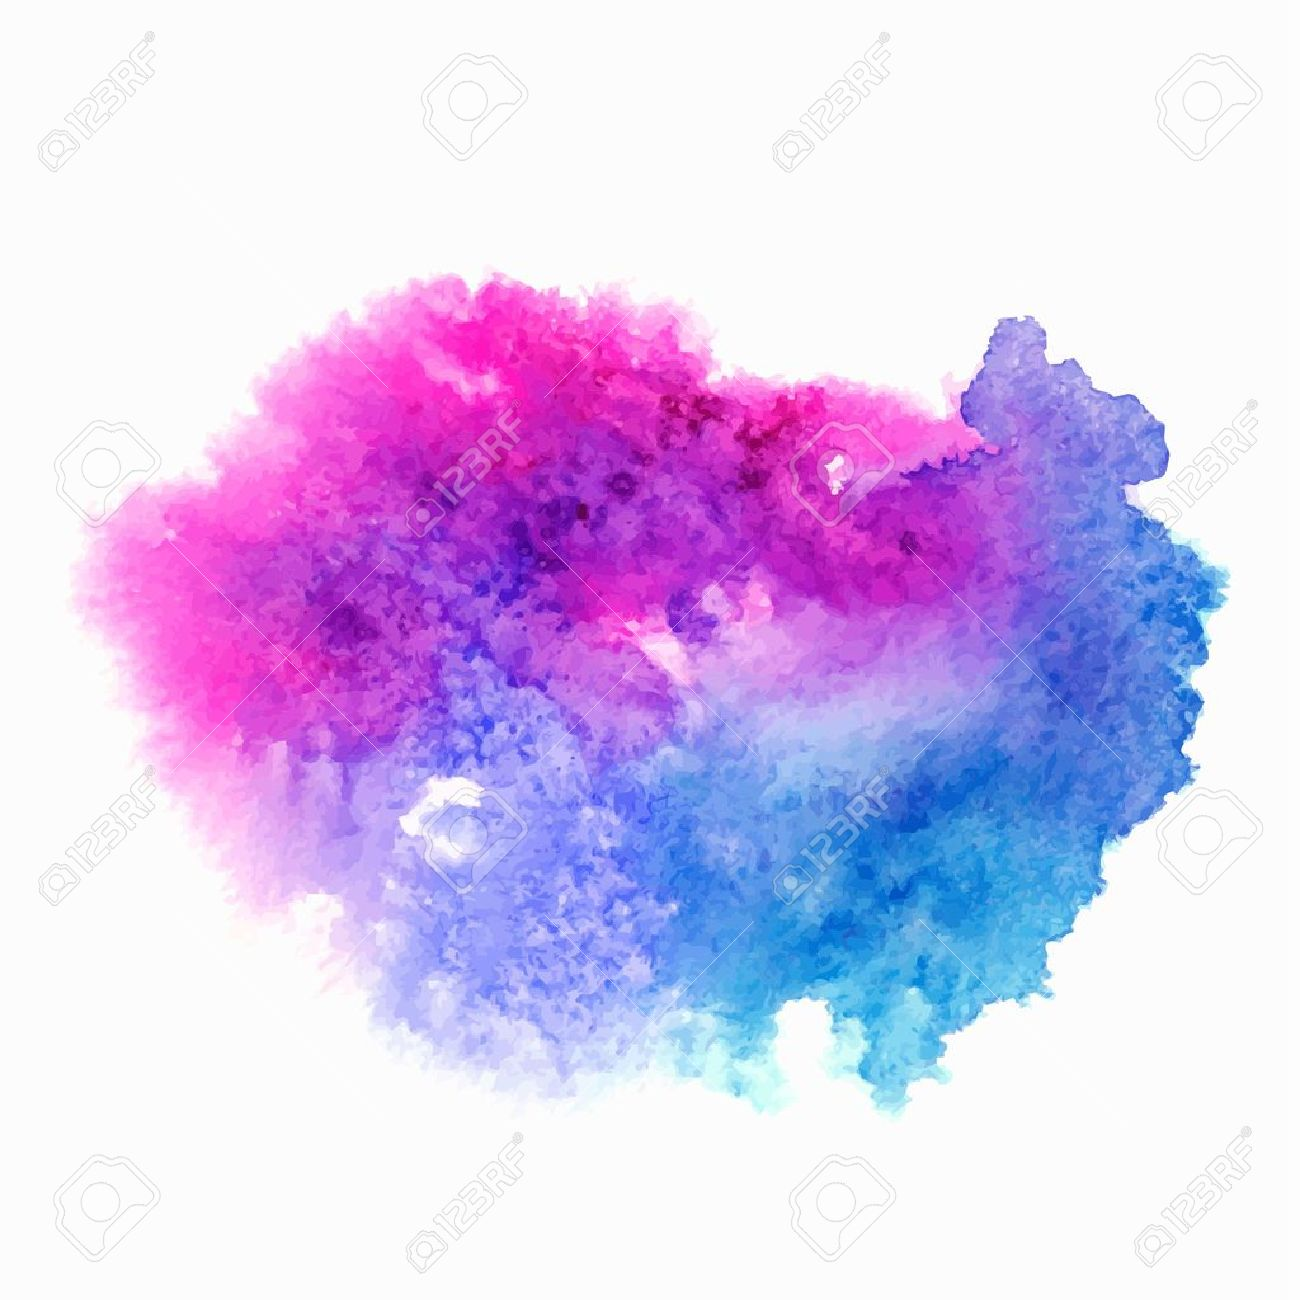 Abstract watercolor splash stock vector 25020292